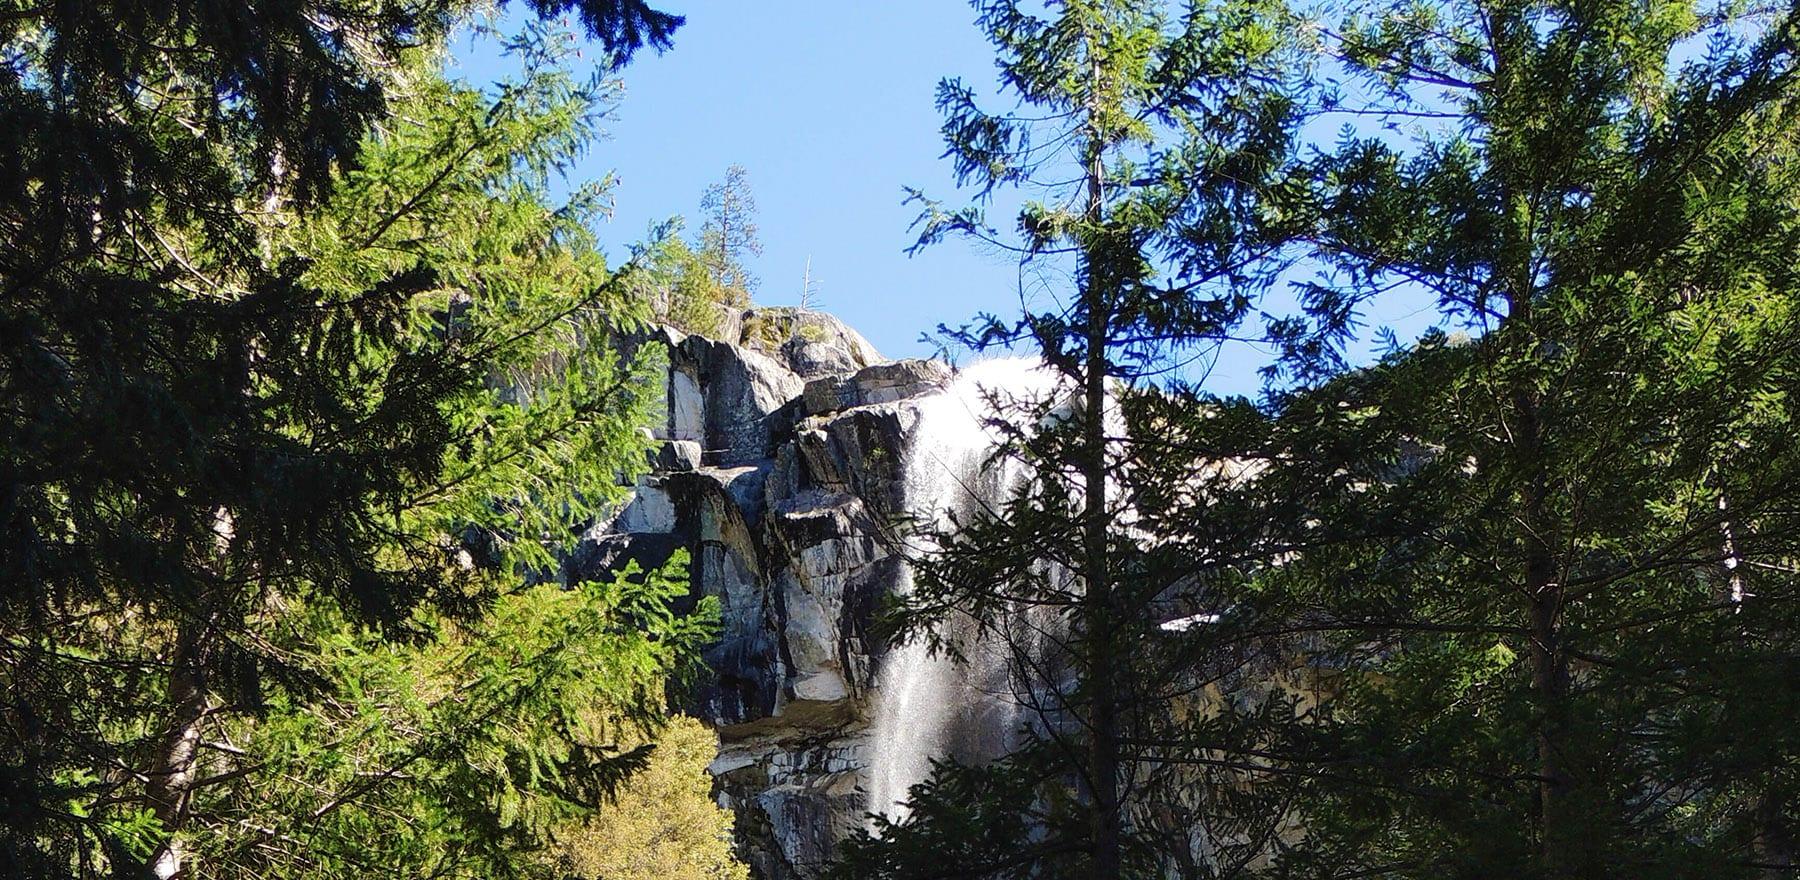 Falls 3 - Mini Yosemite Falls